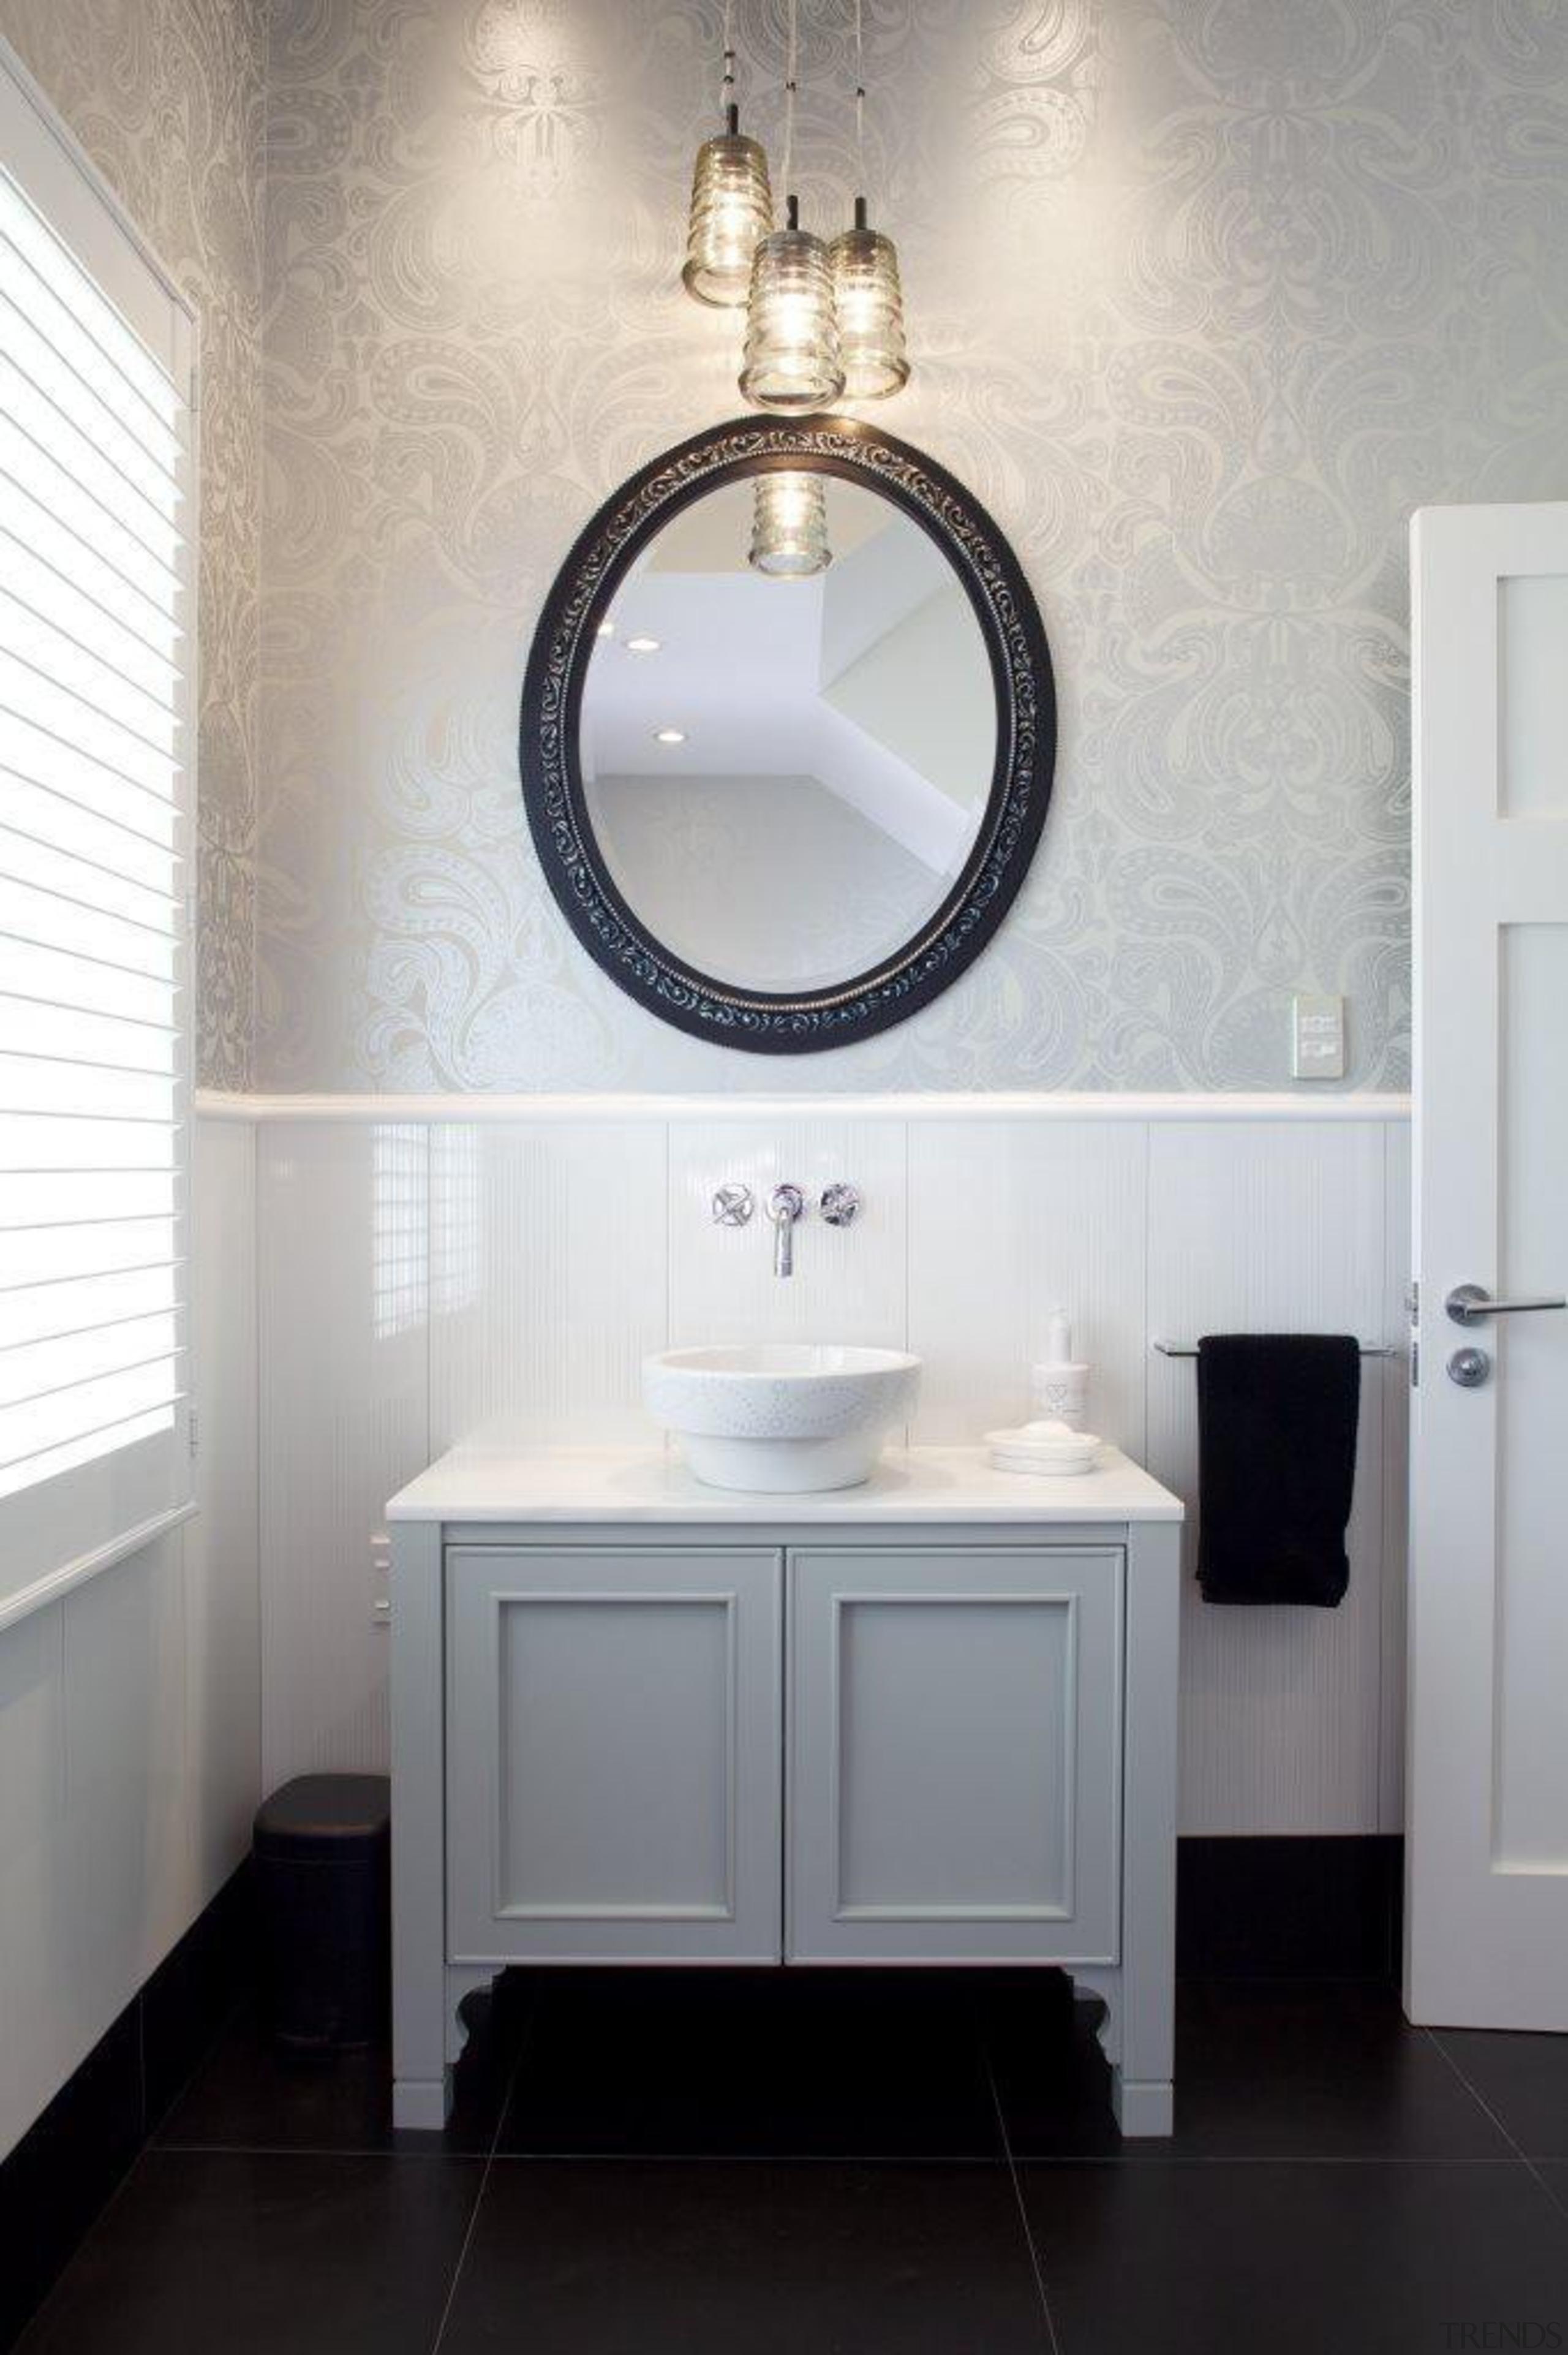 classicalguestbathroom1.jpg - classicalguestbathroom1.jpg - bathroom | bathroom accessory bathroom, bathroom accessory, bathroom cabinet, bathroom sink, floor, home, interior design, plumbing fixture, product design, room, sink, tap, white, gray